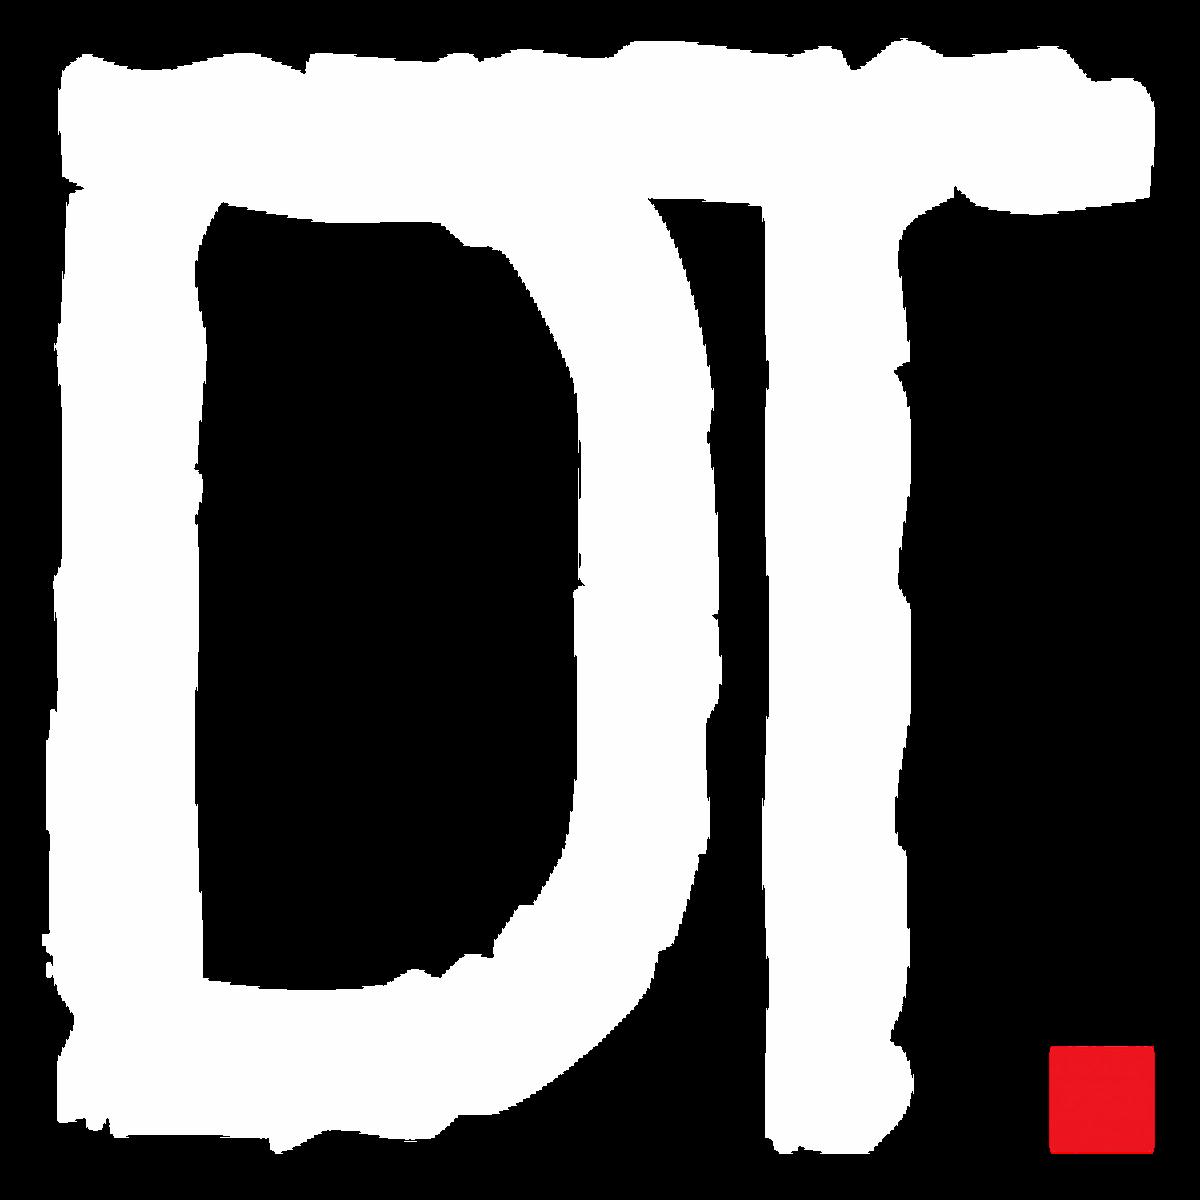 DT Business Strategies